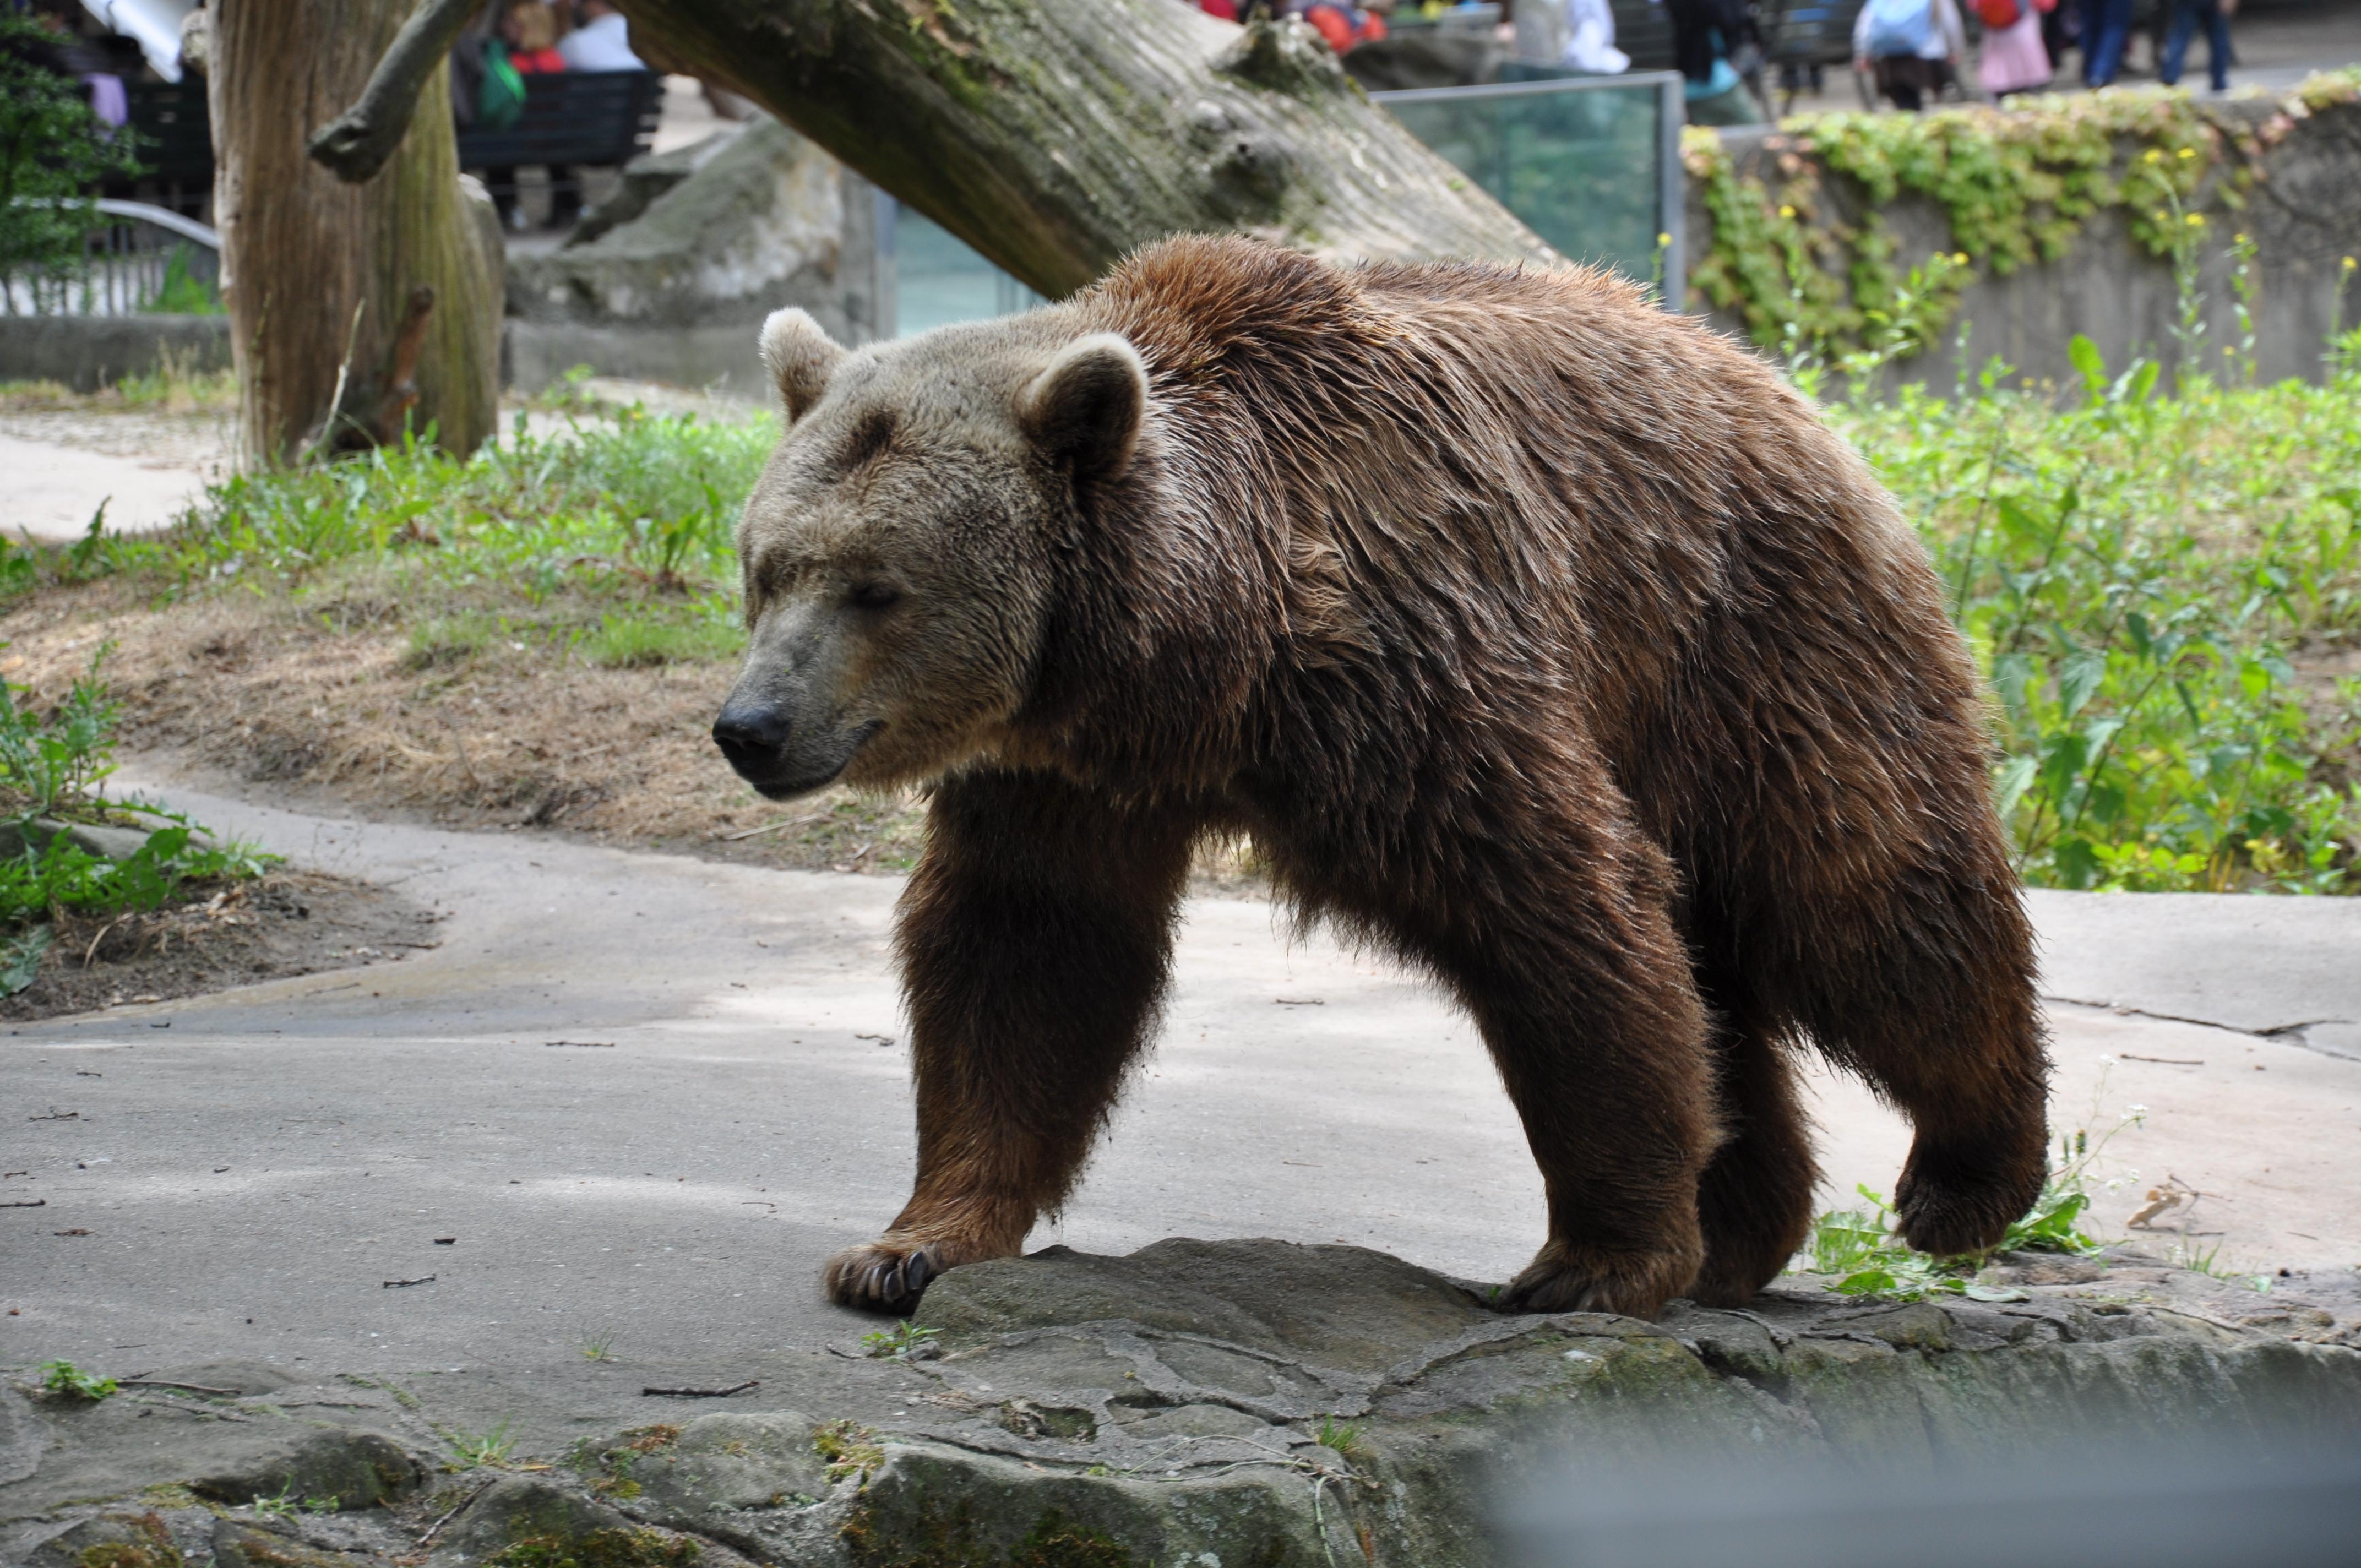 File:Braunbär Berlin Zoo img01.jpg - Wikimedia Commons